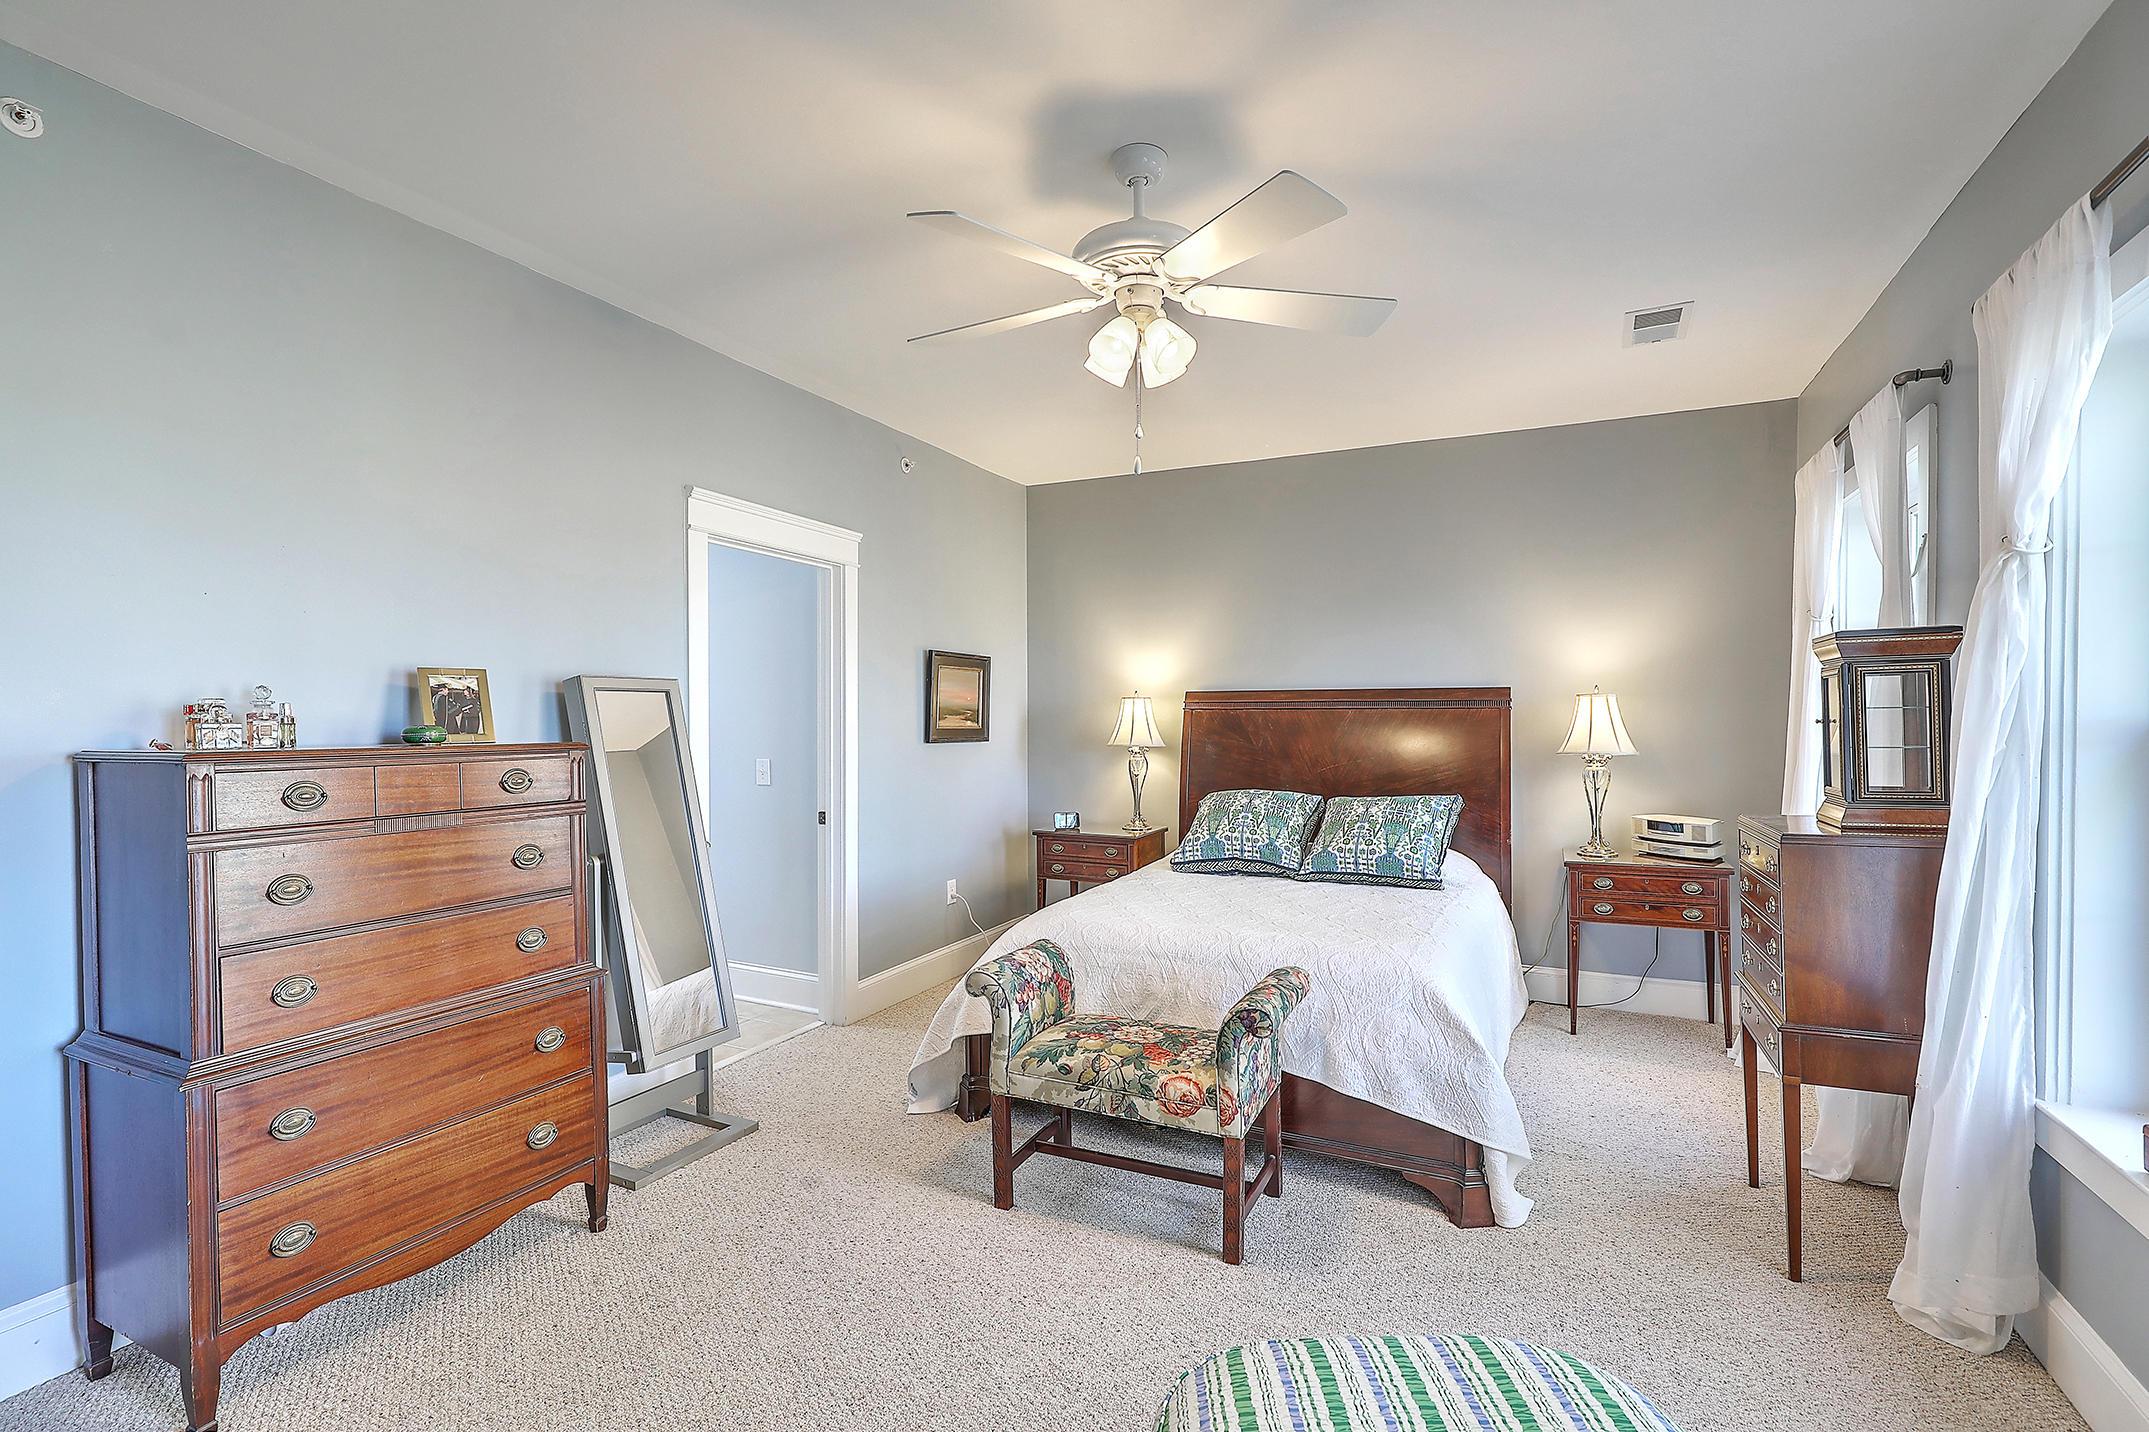 Etiwan Pointe Homes For Sale - 124 Winding Creek, Mount Pleasant, SC - 24